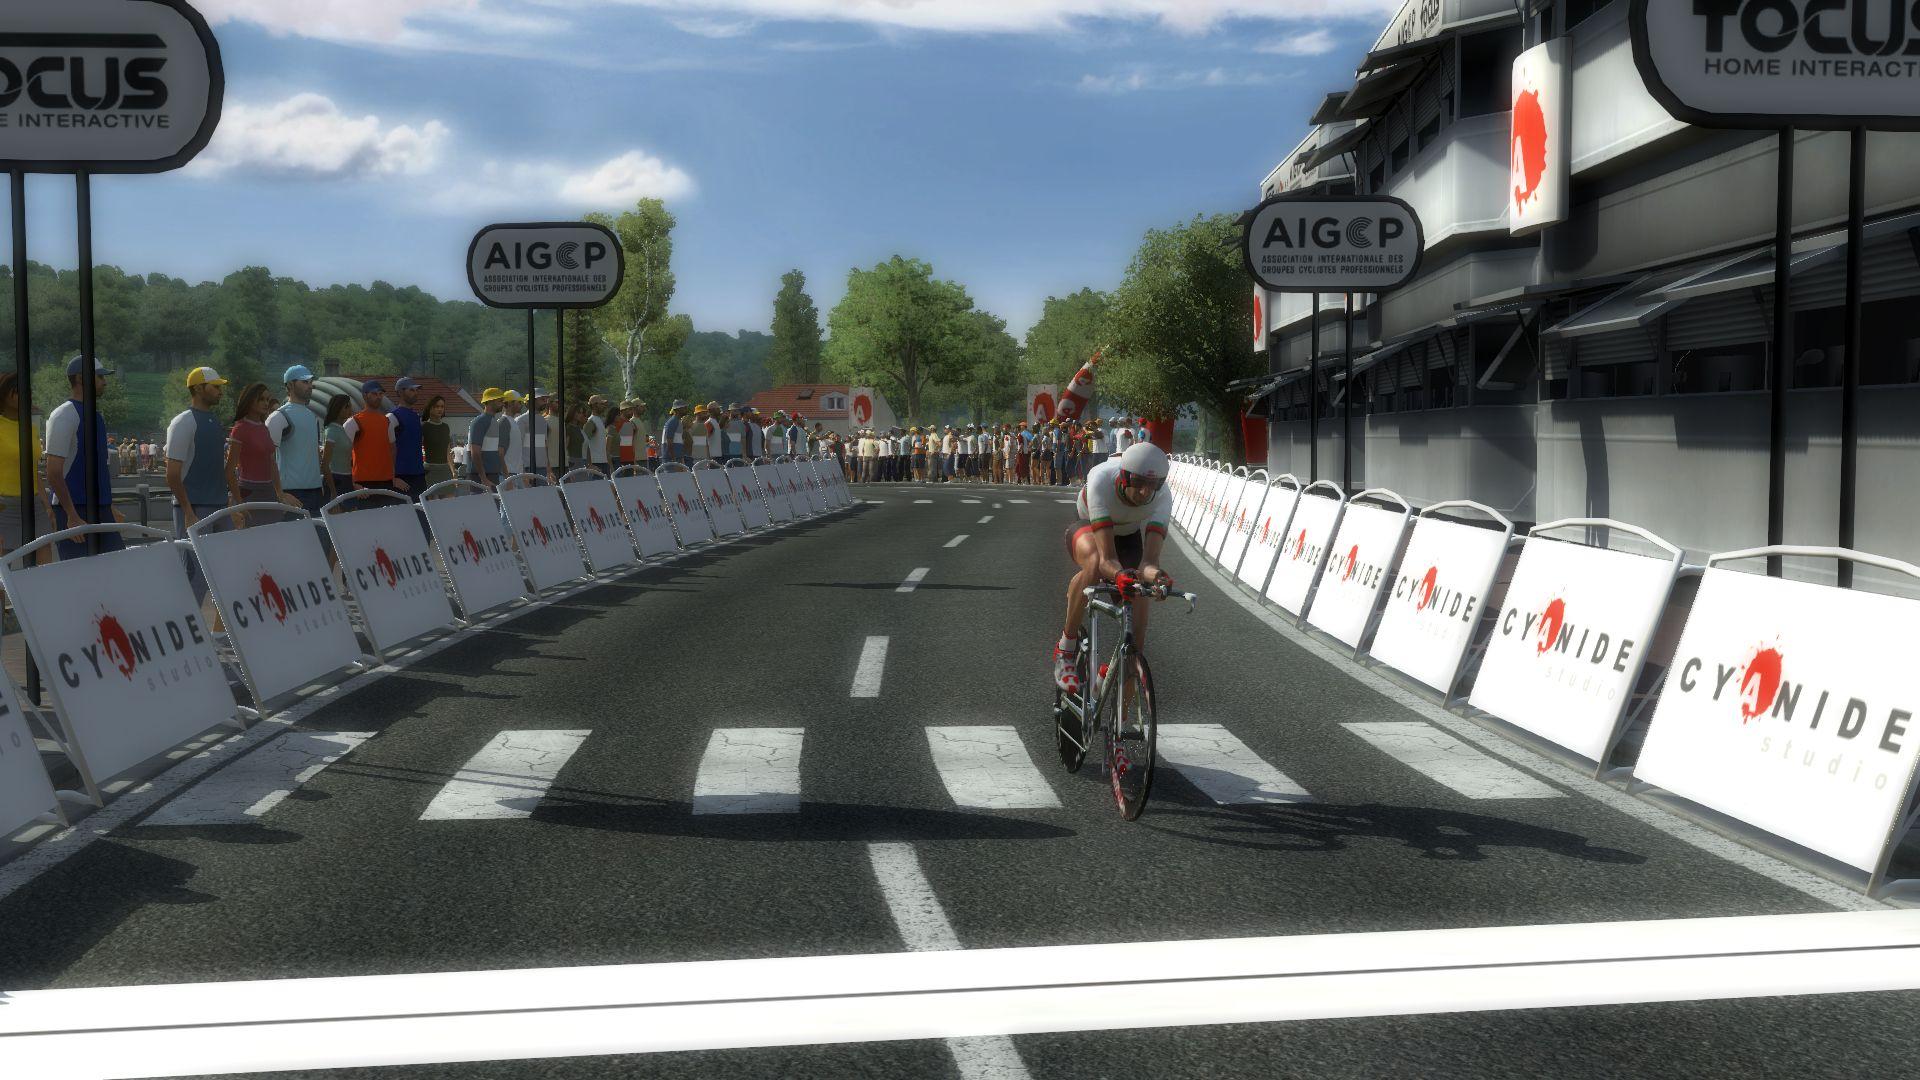 pcmdaily.com/images/mg/2019/Races/C1/Bayern/S4/mg19_bay_s04_46.jpg